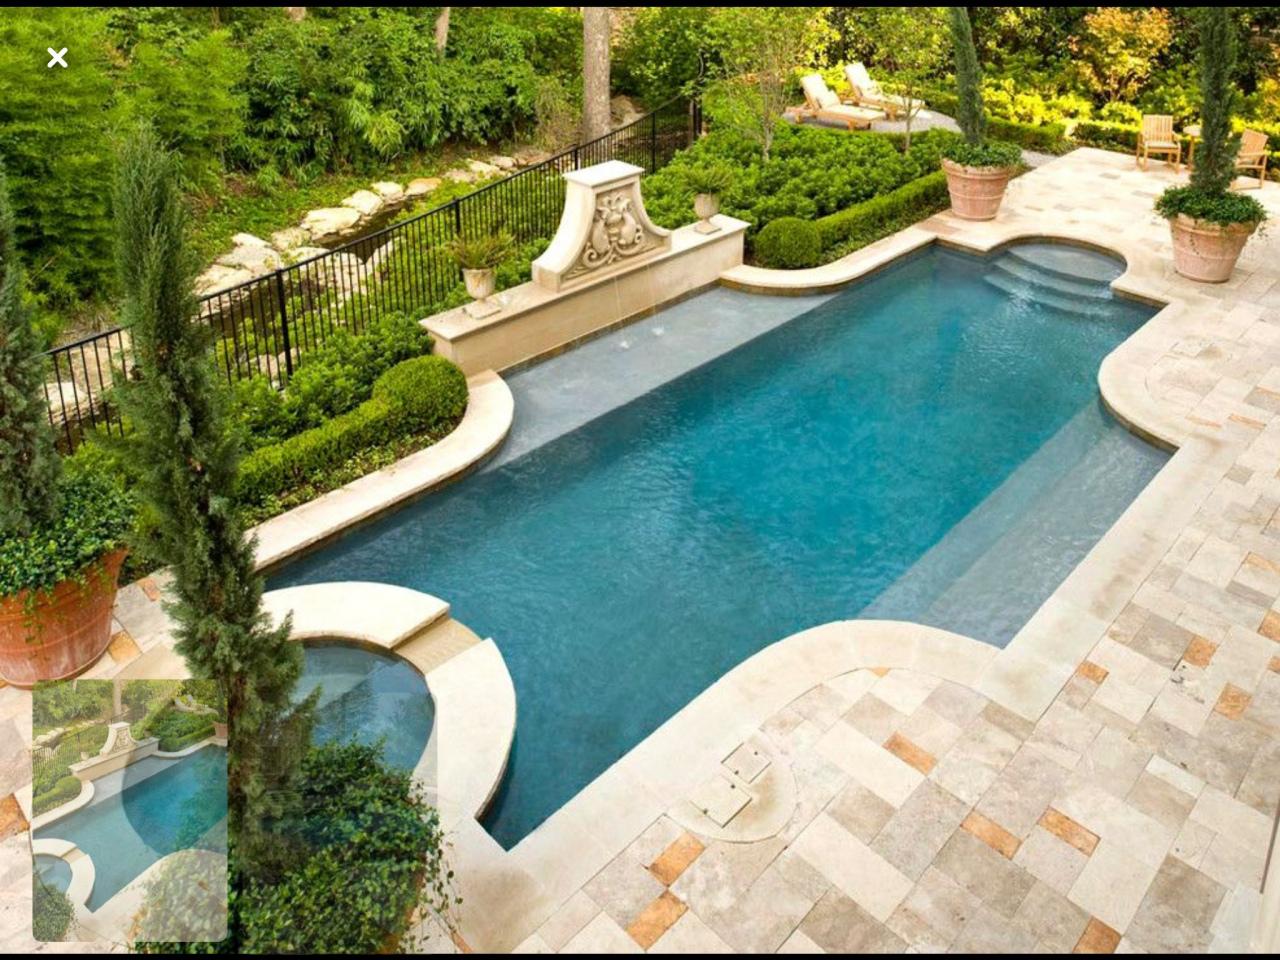 landscaping around pool yakuzi pool garten durch landscaping around pool